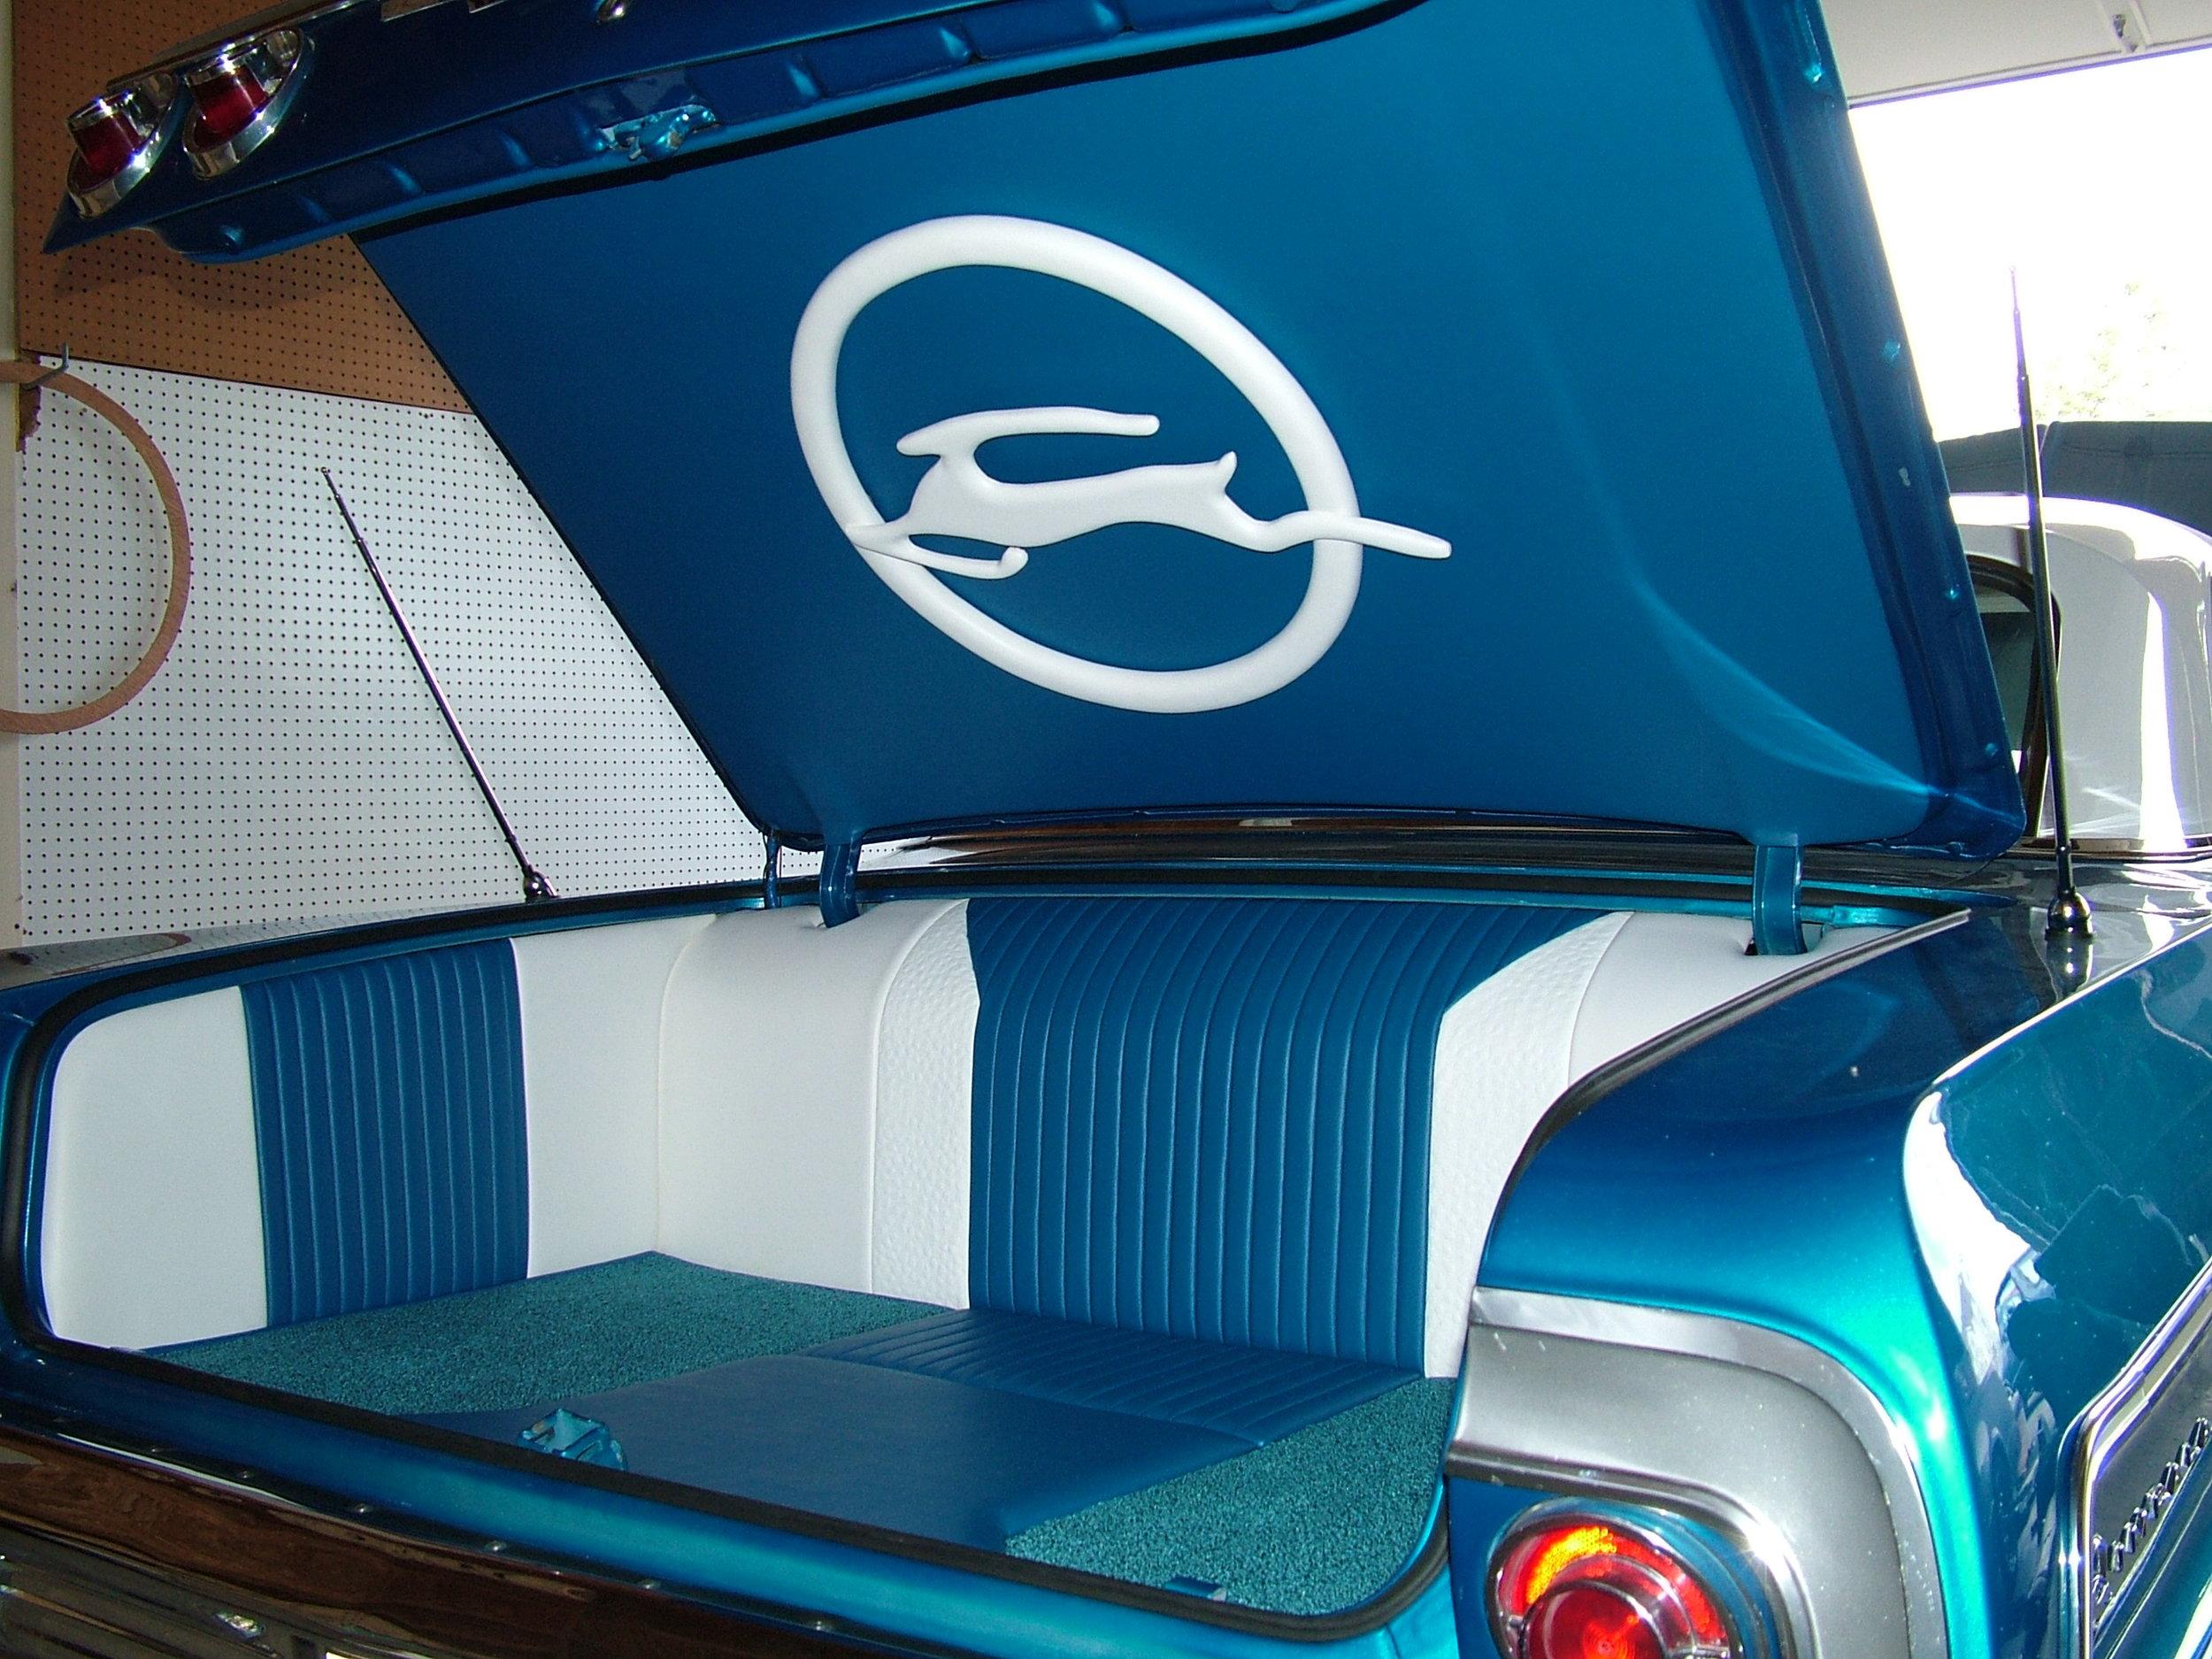 Impala - Custom Trunk,  Blue and white stitched leather.